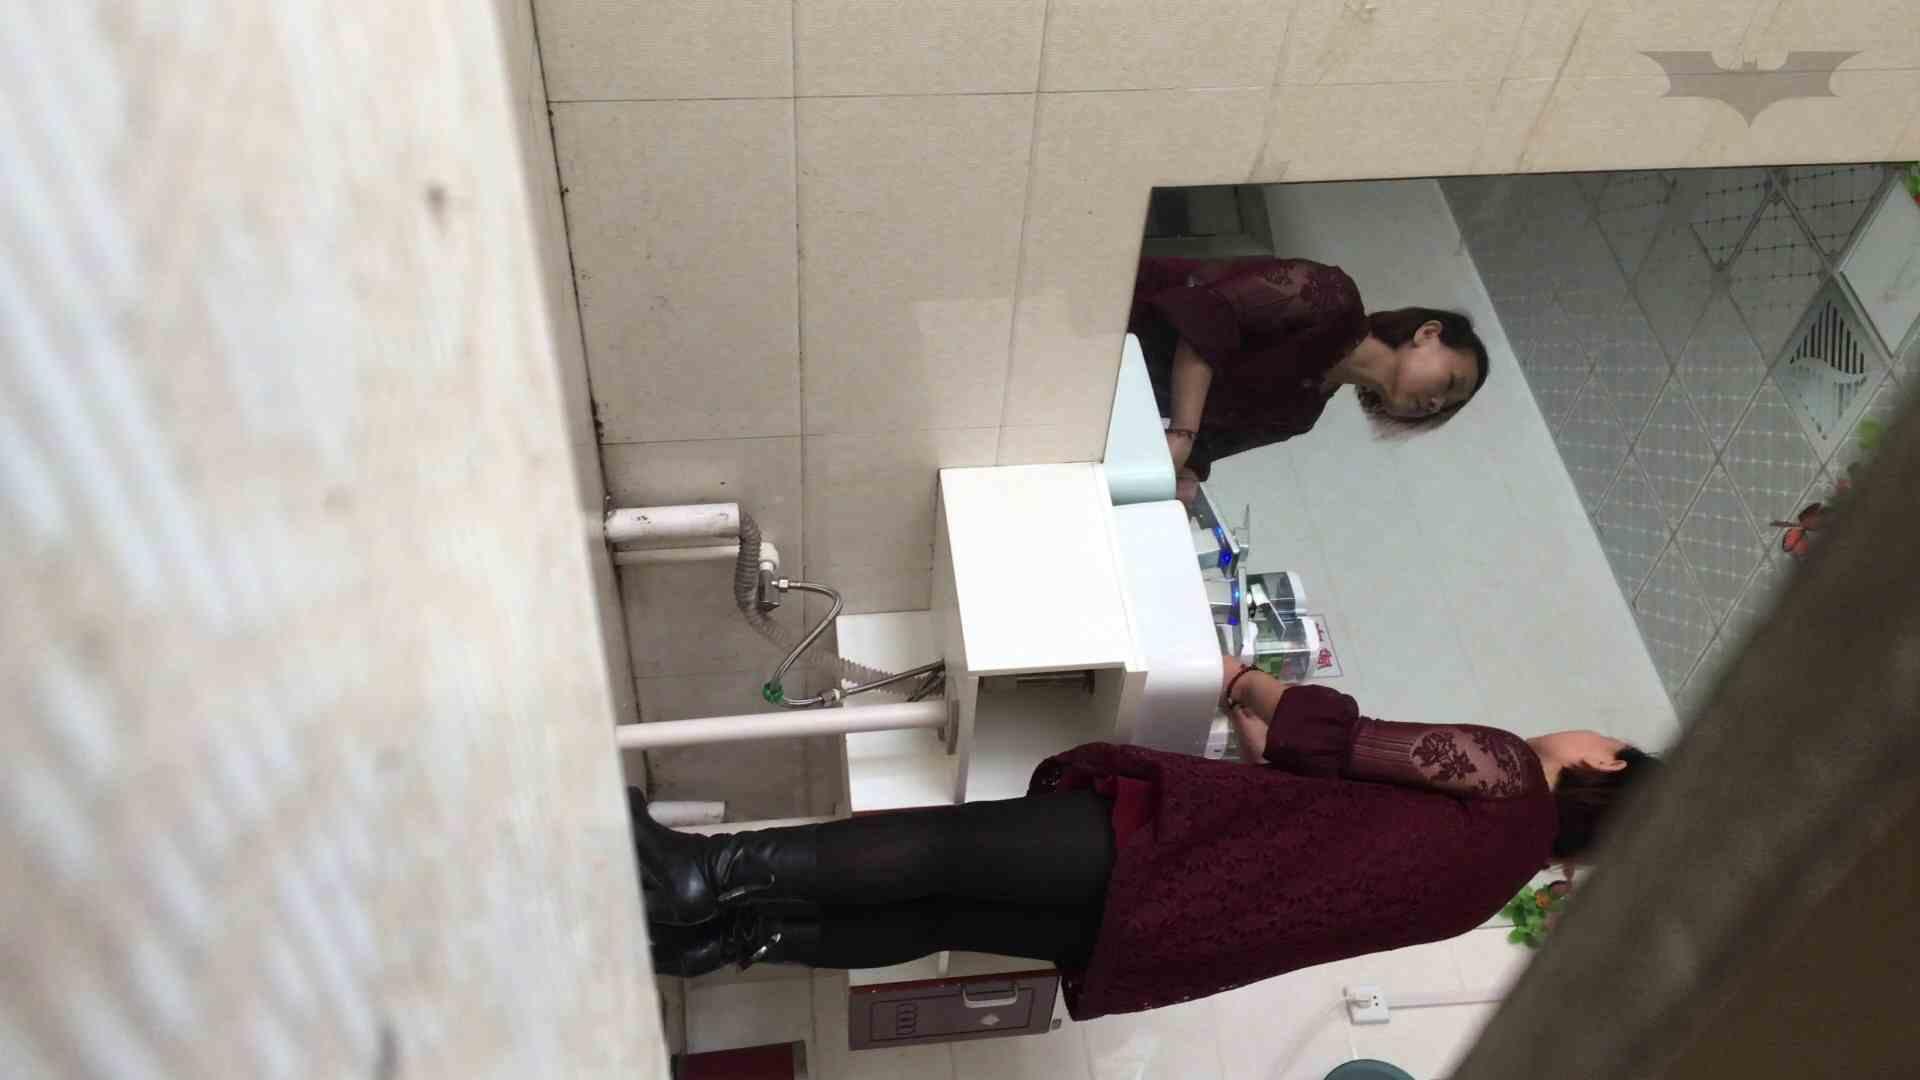 芸術大学ガチ潜入盗撮 JD盗撮 美女の洗面所の秘密 Vol.111 洗面所 ヌード画像 96画像 34